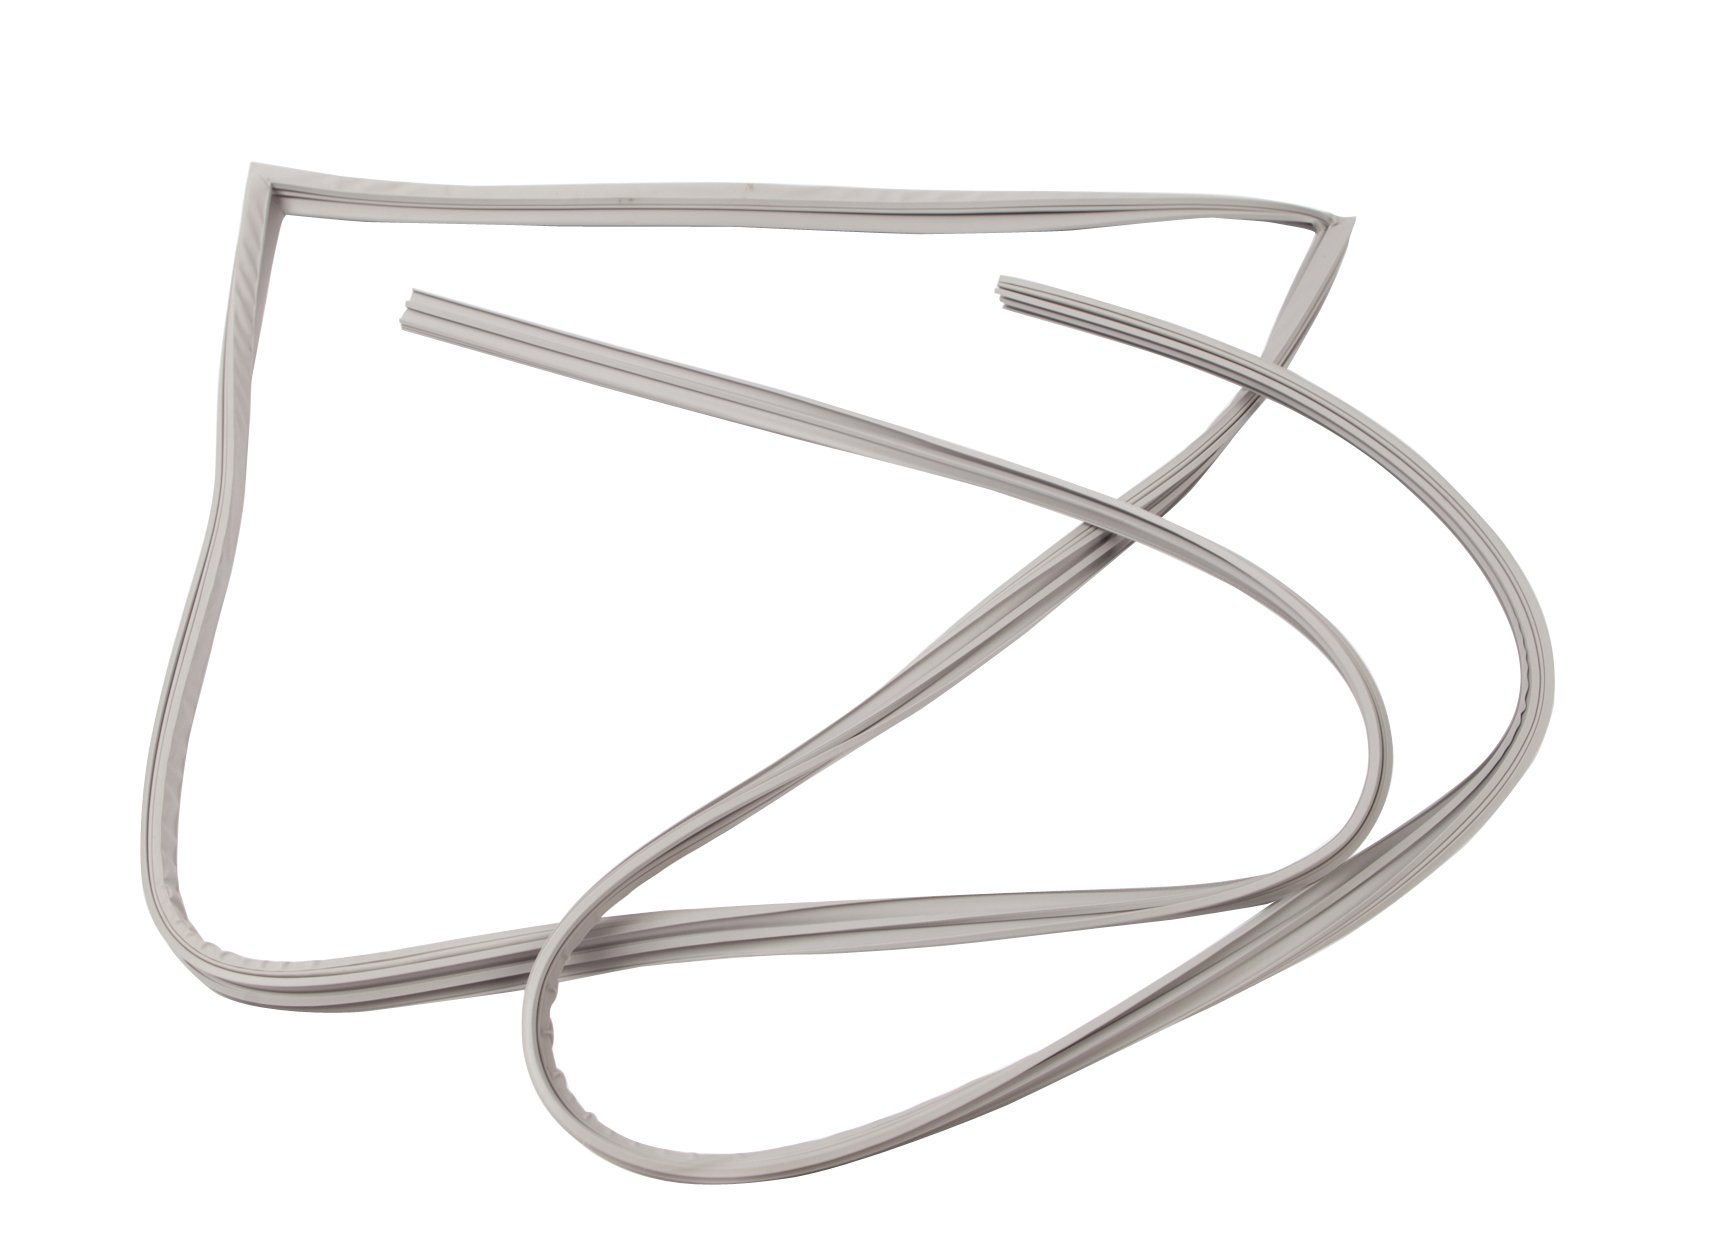 Delfield 1702211 Snap-In 3 Side Stainless Steel Door Gasket 72 Inch Long with 14 Inch Sleeper